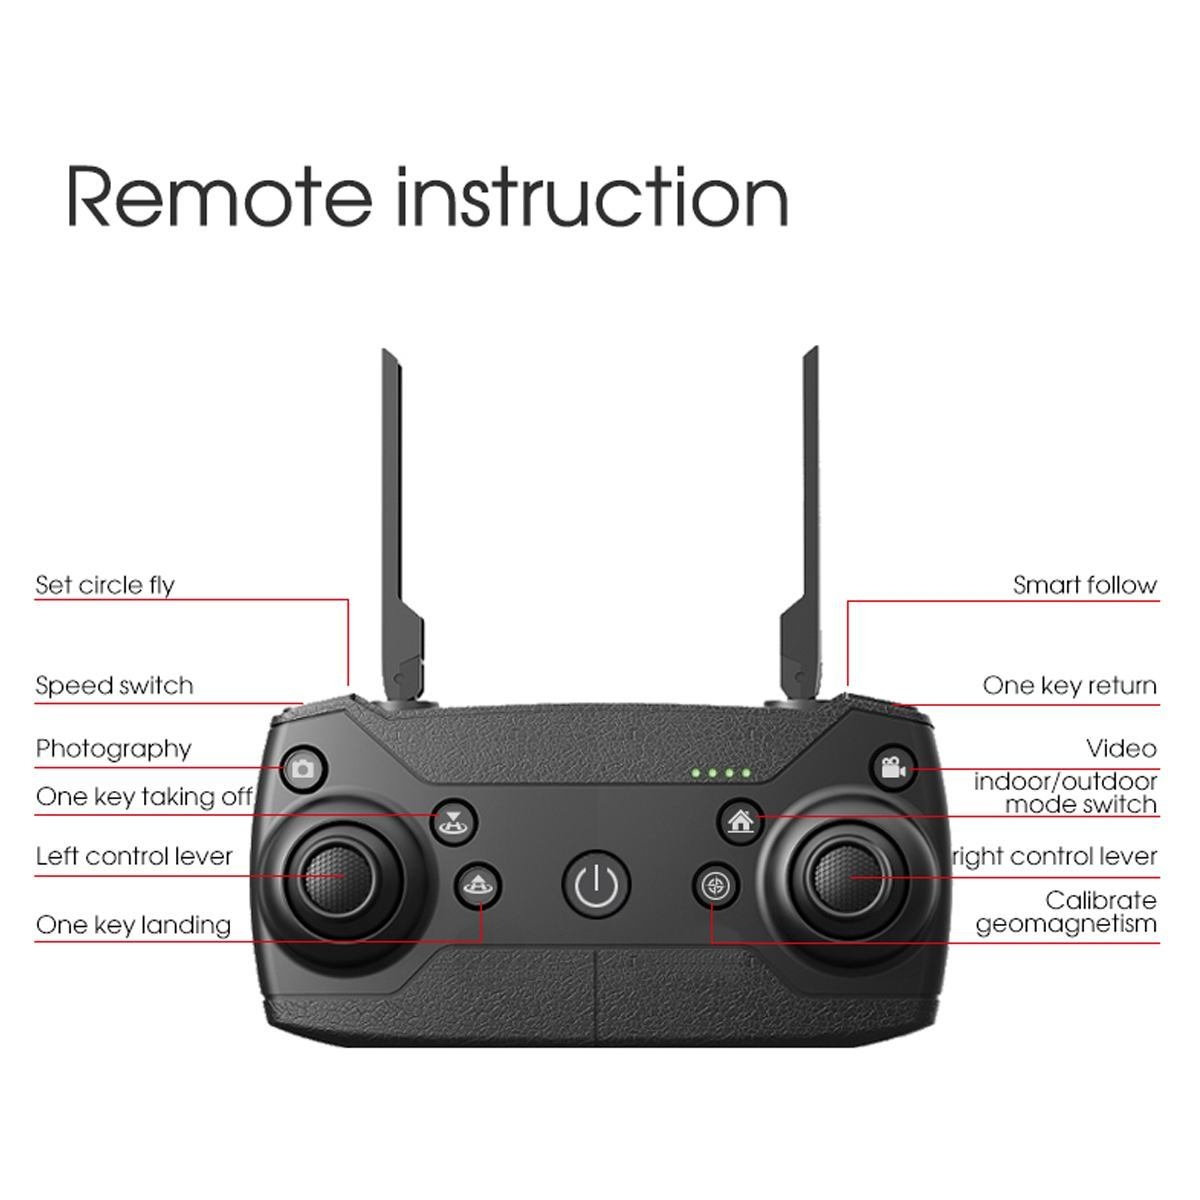 Generic Drone Rc Wifi Selfie Camera Haute Def Prix Pas